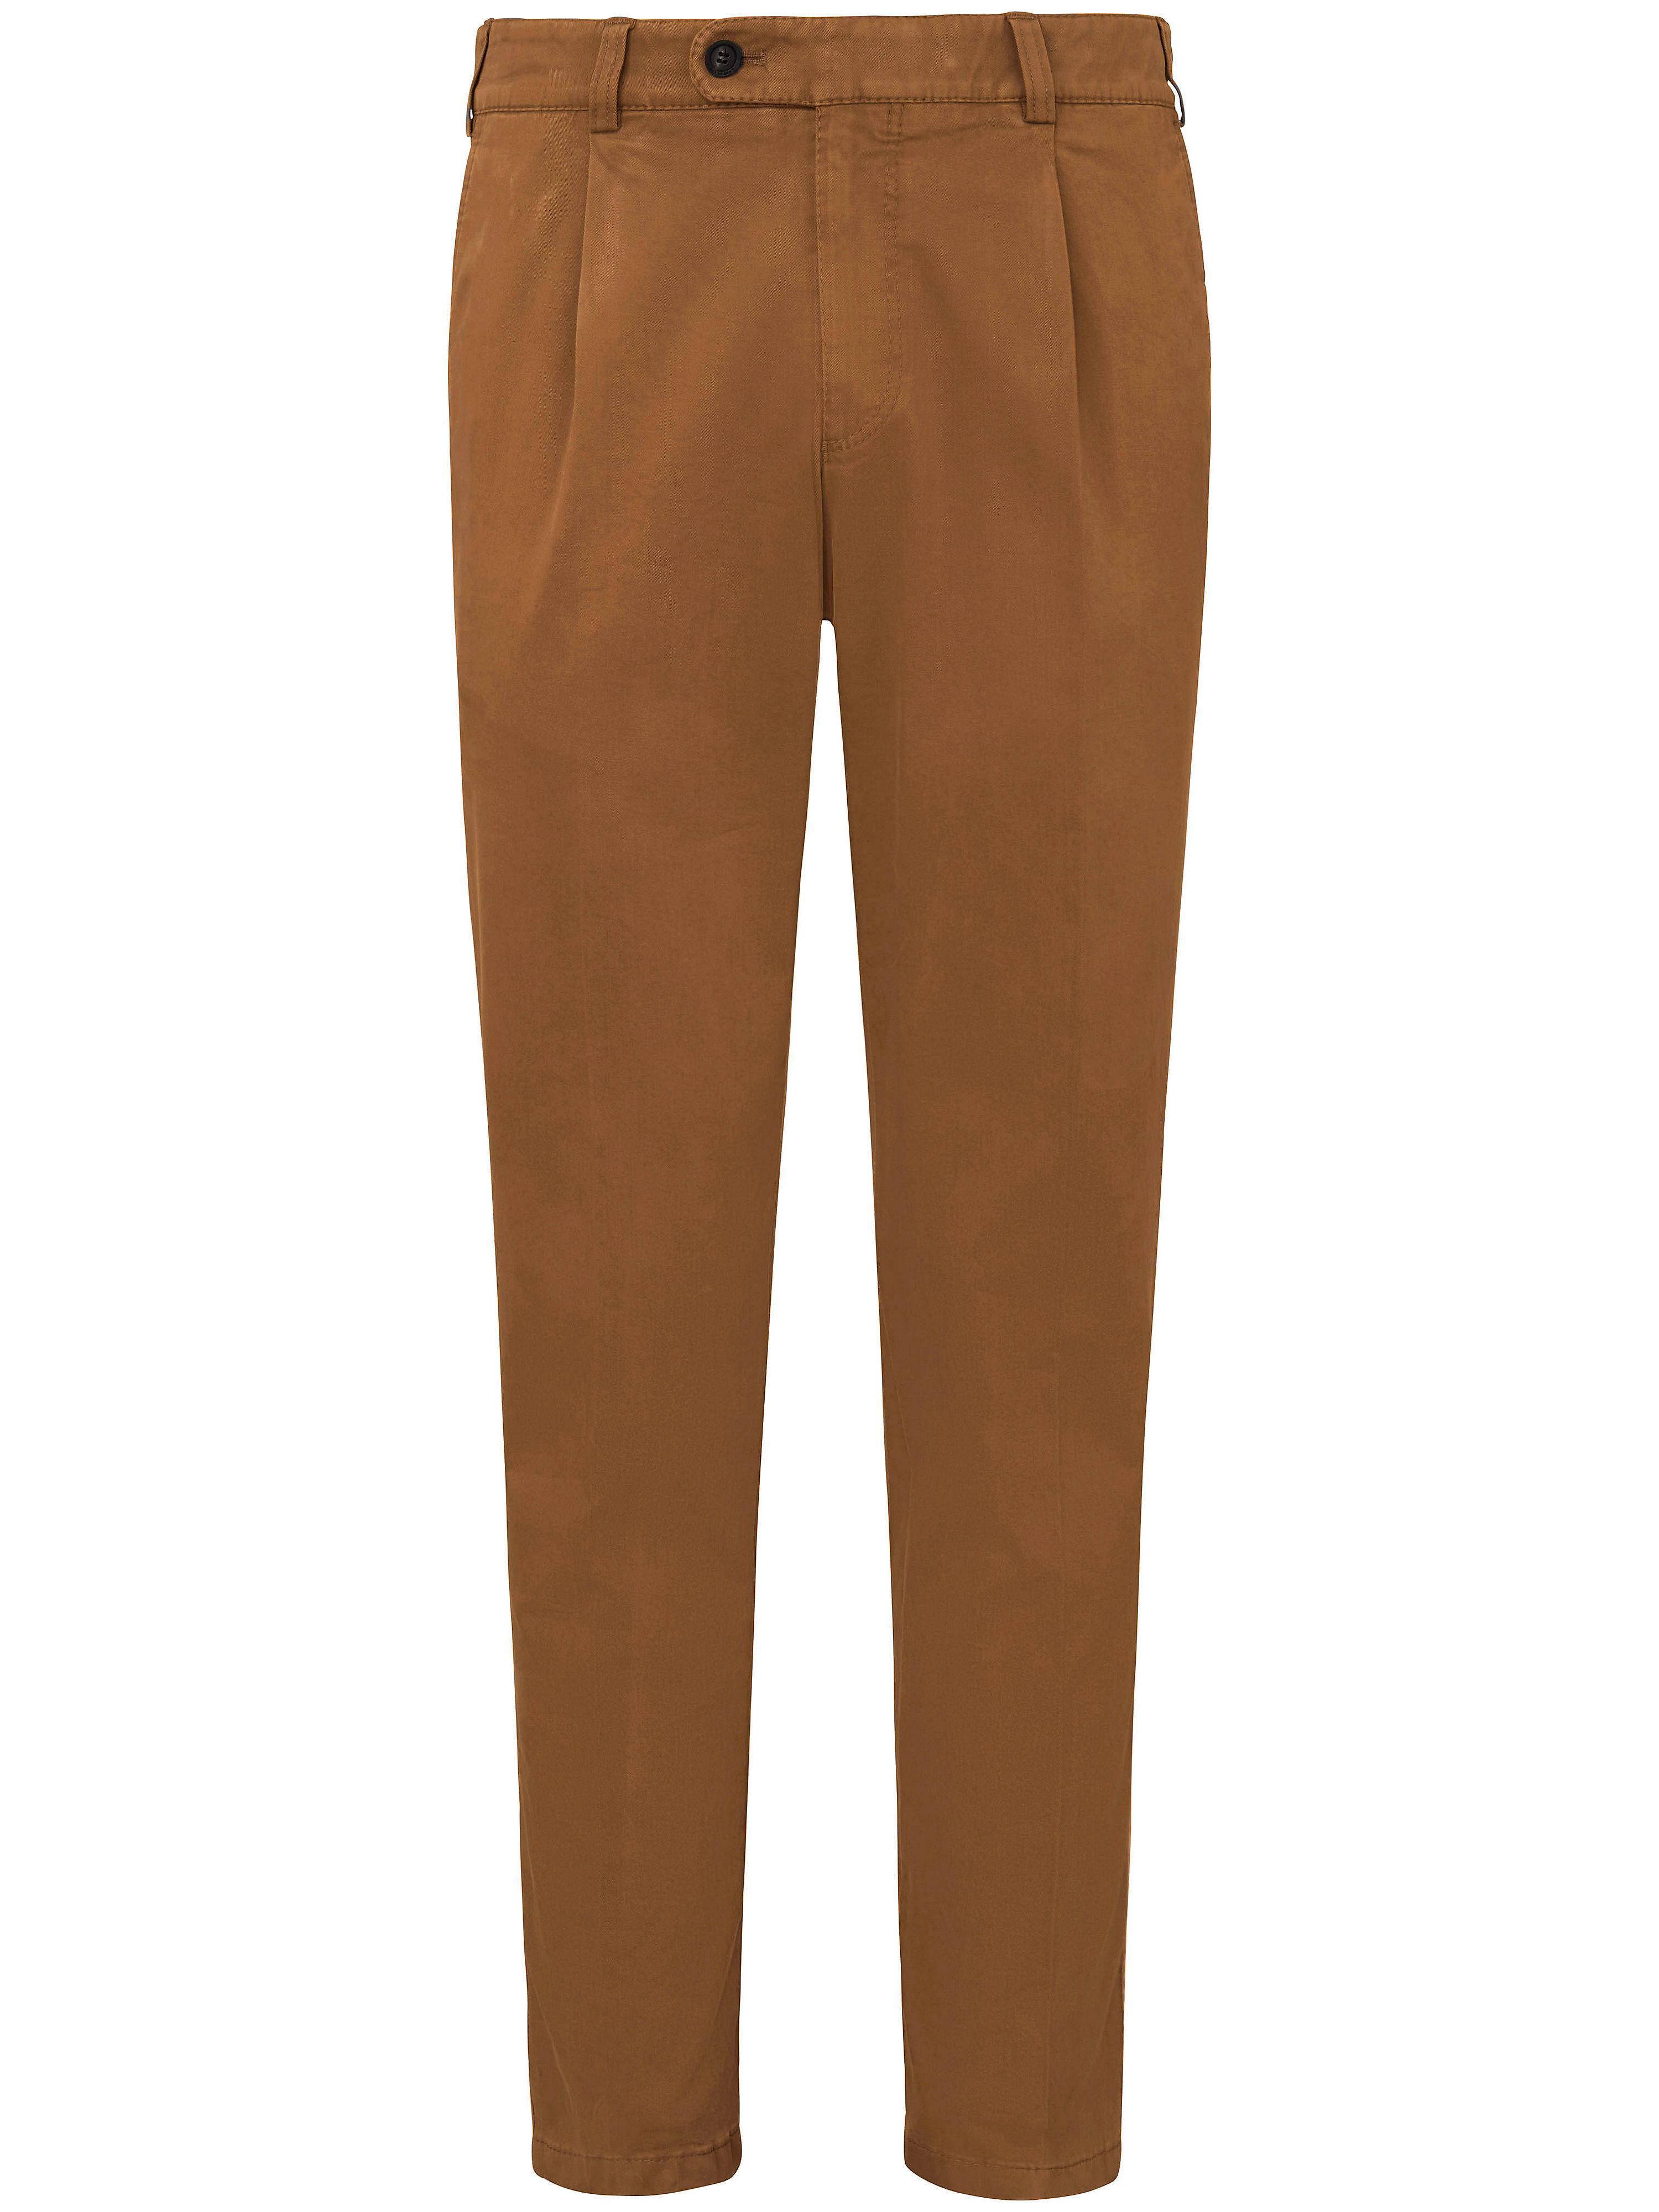 Image of   Perfect-Cut bukser læg model Luis Fra Eurex by Brax gul